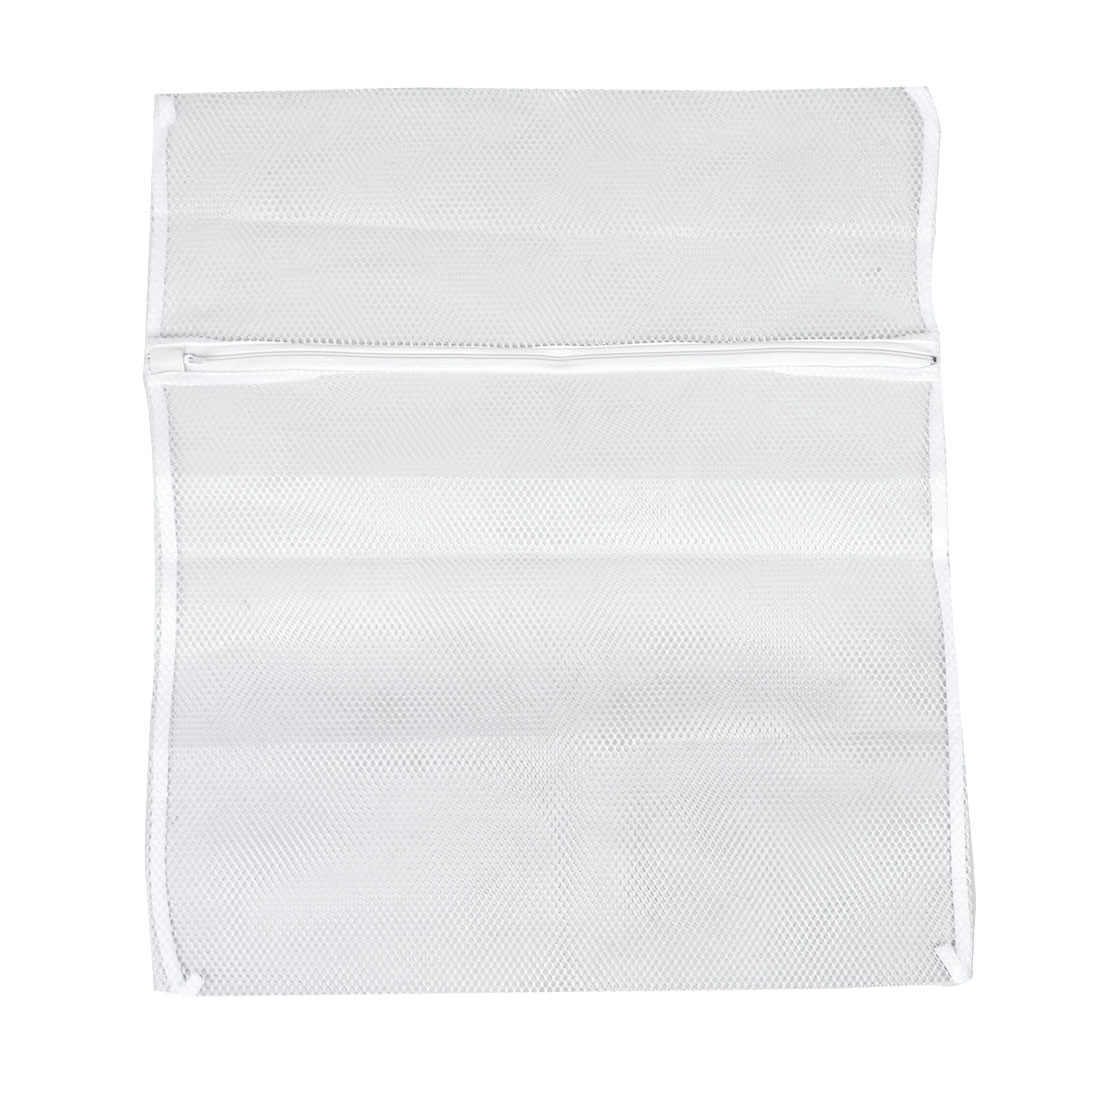 Meshy Design Zip Up Laundry Clothes Washing Bag 60cm x 50cm